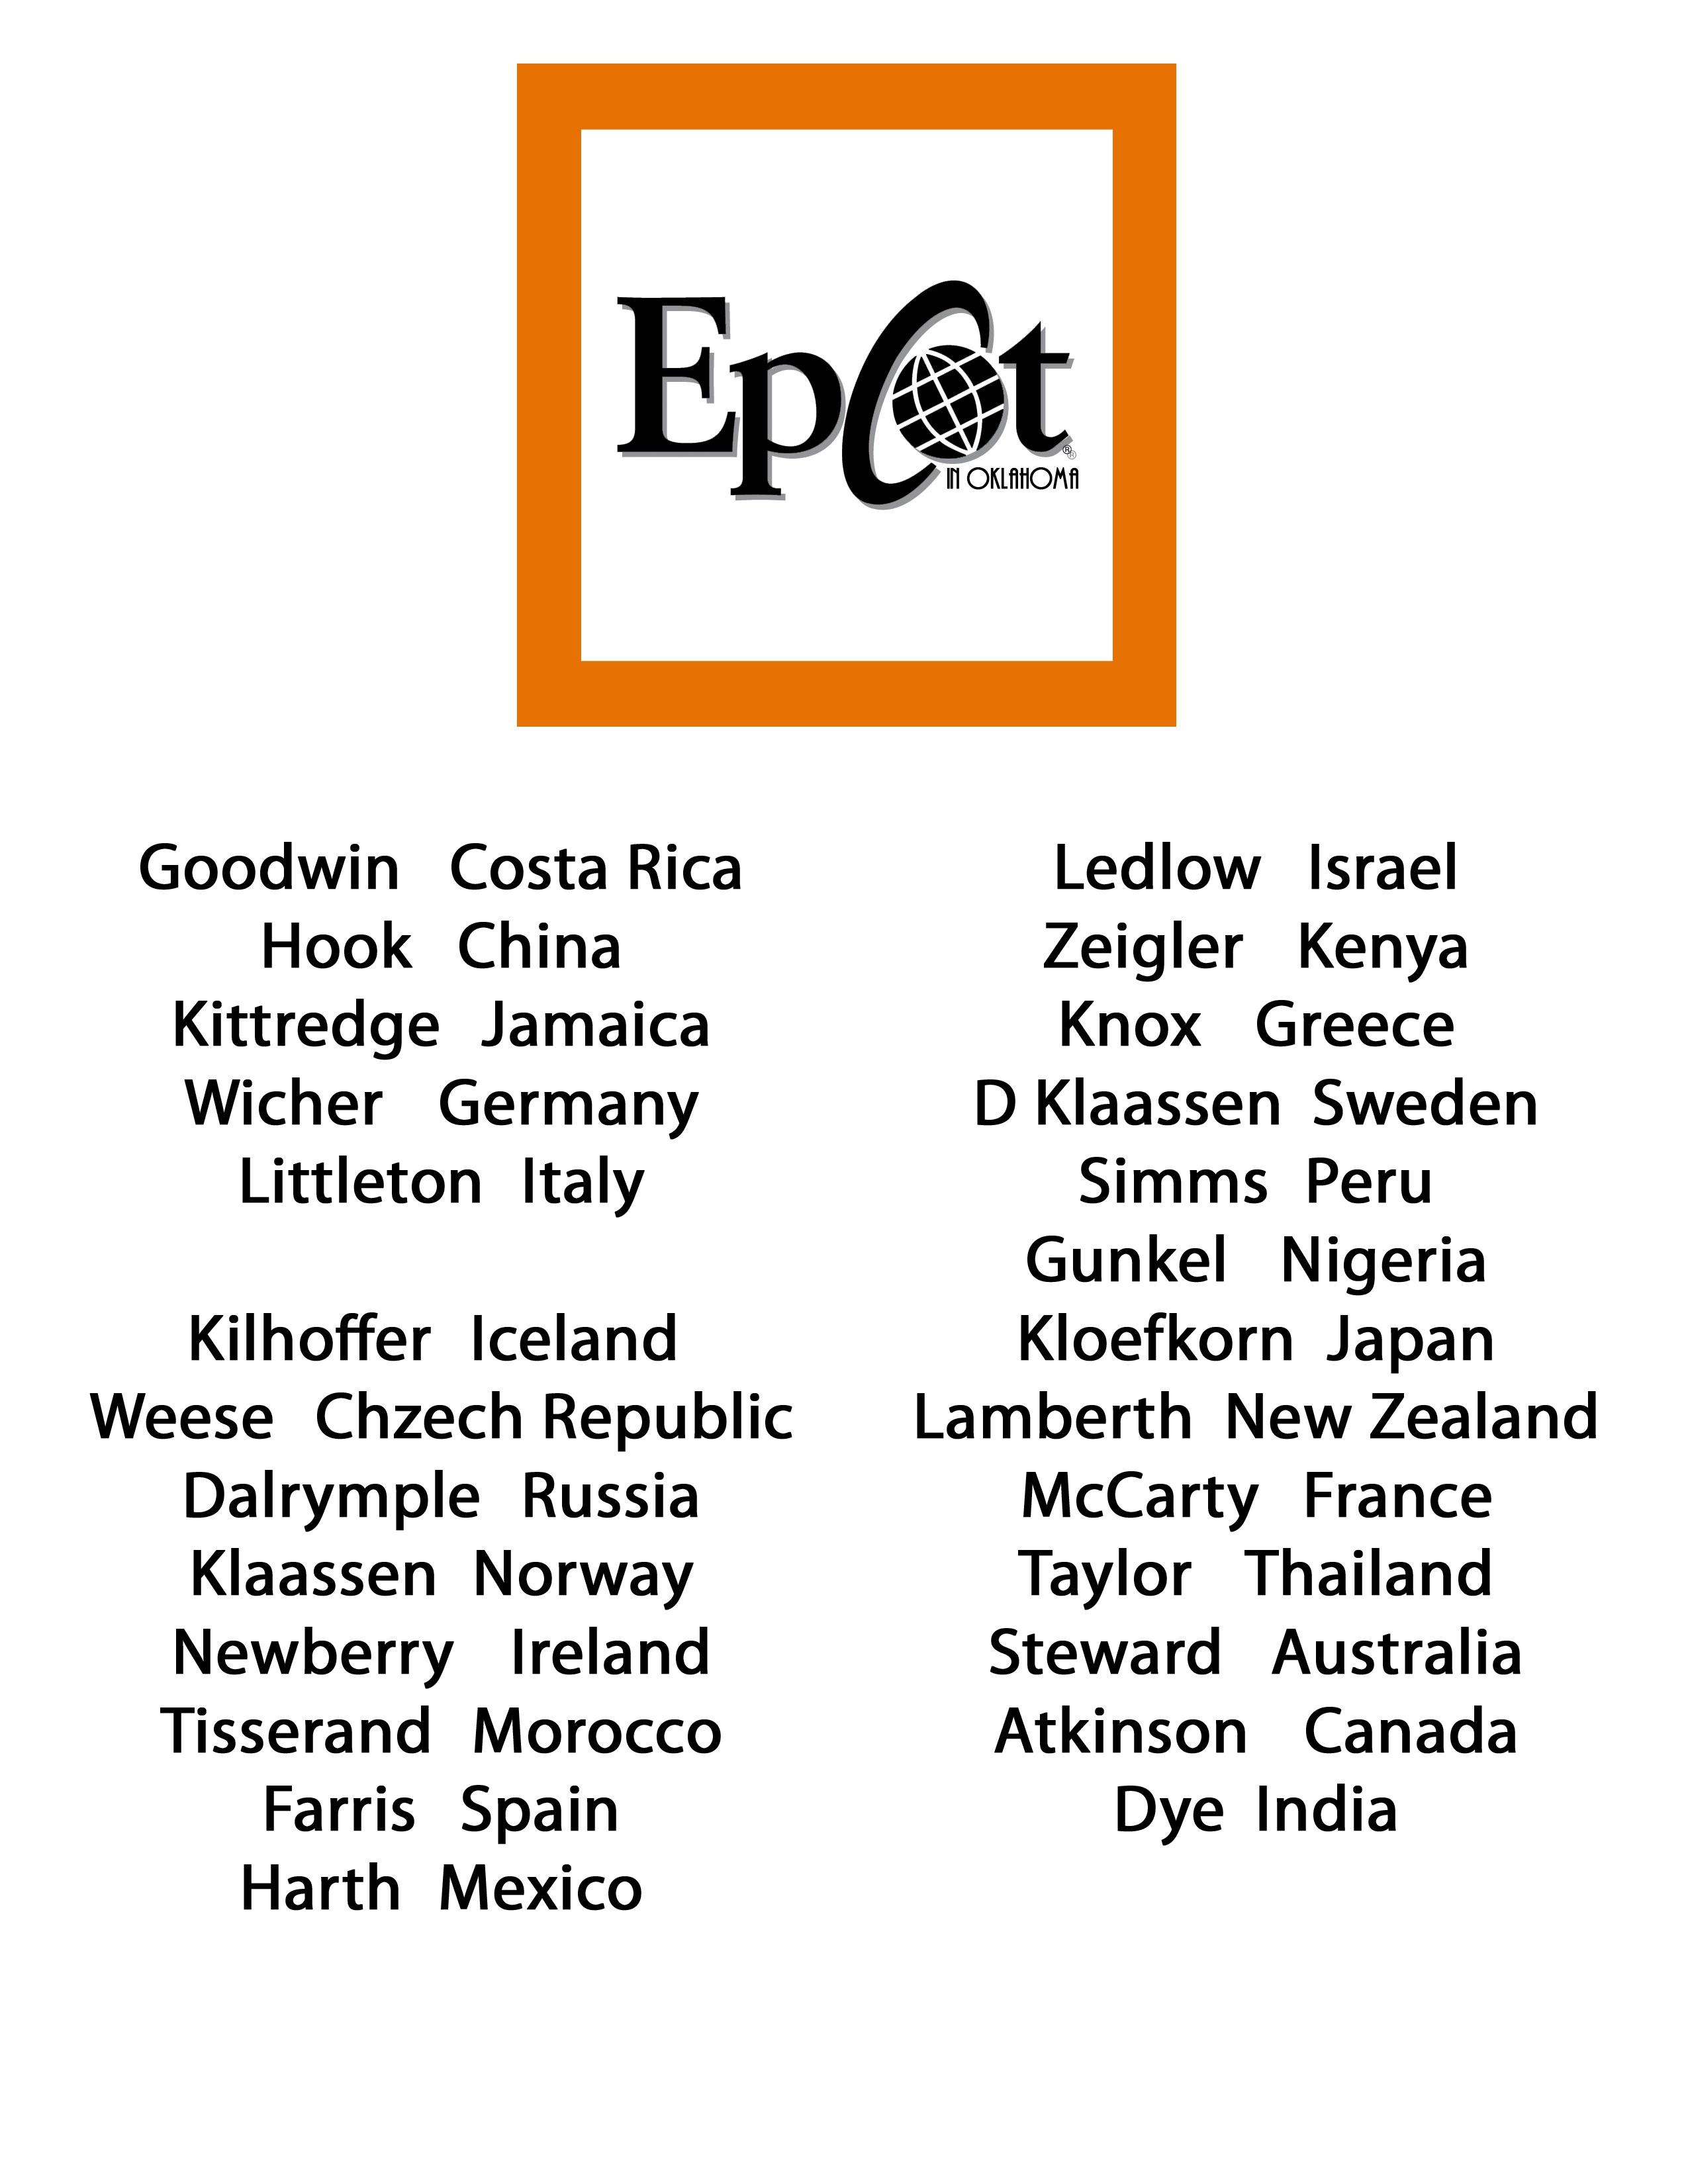 epcot in oklahoma name list